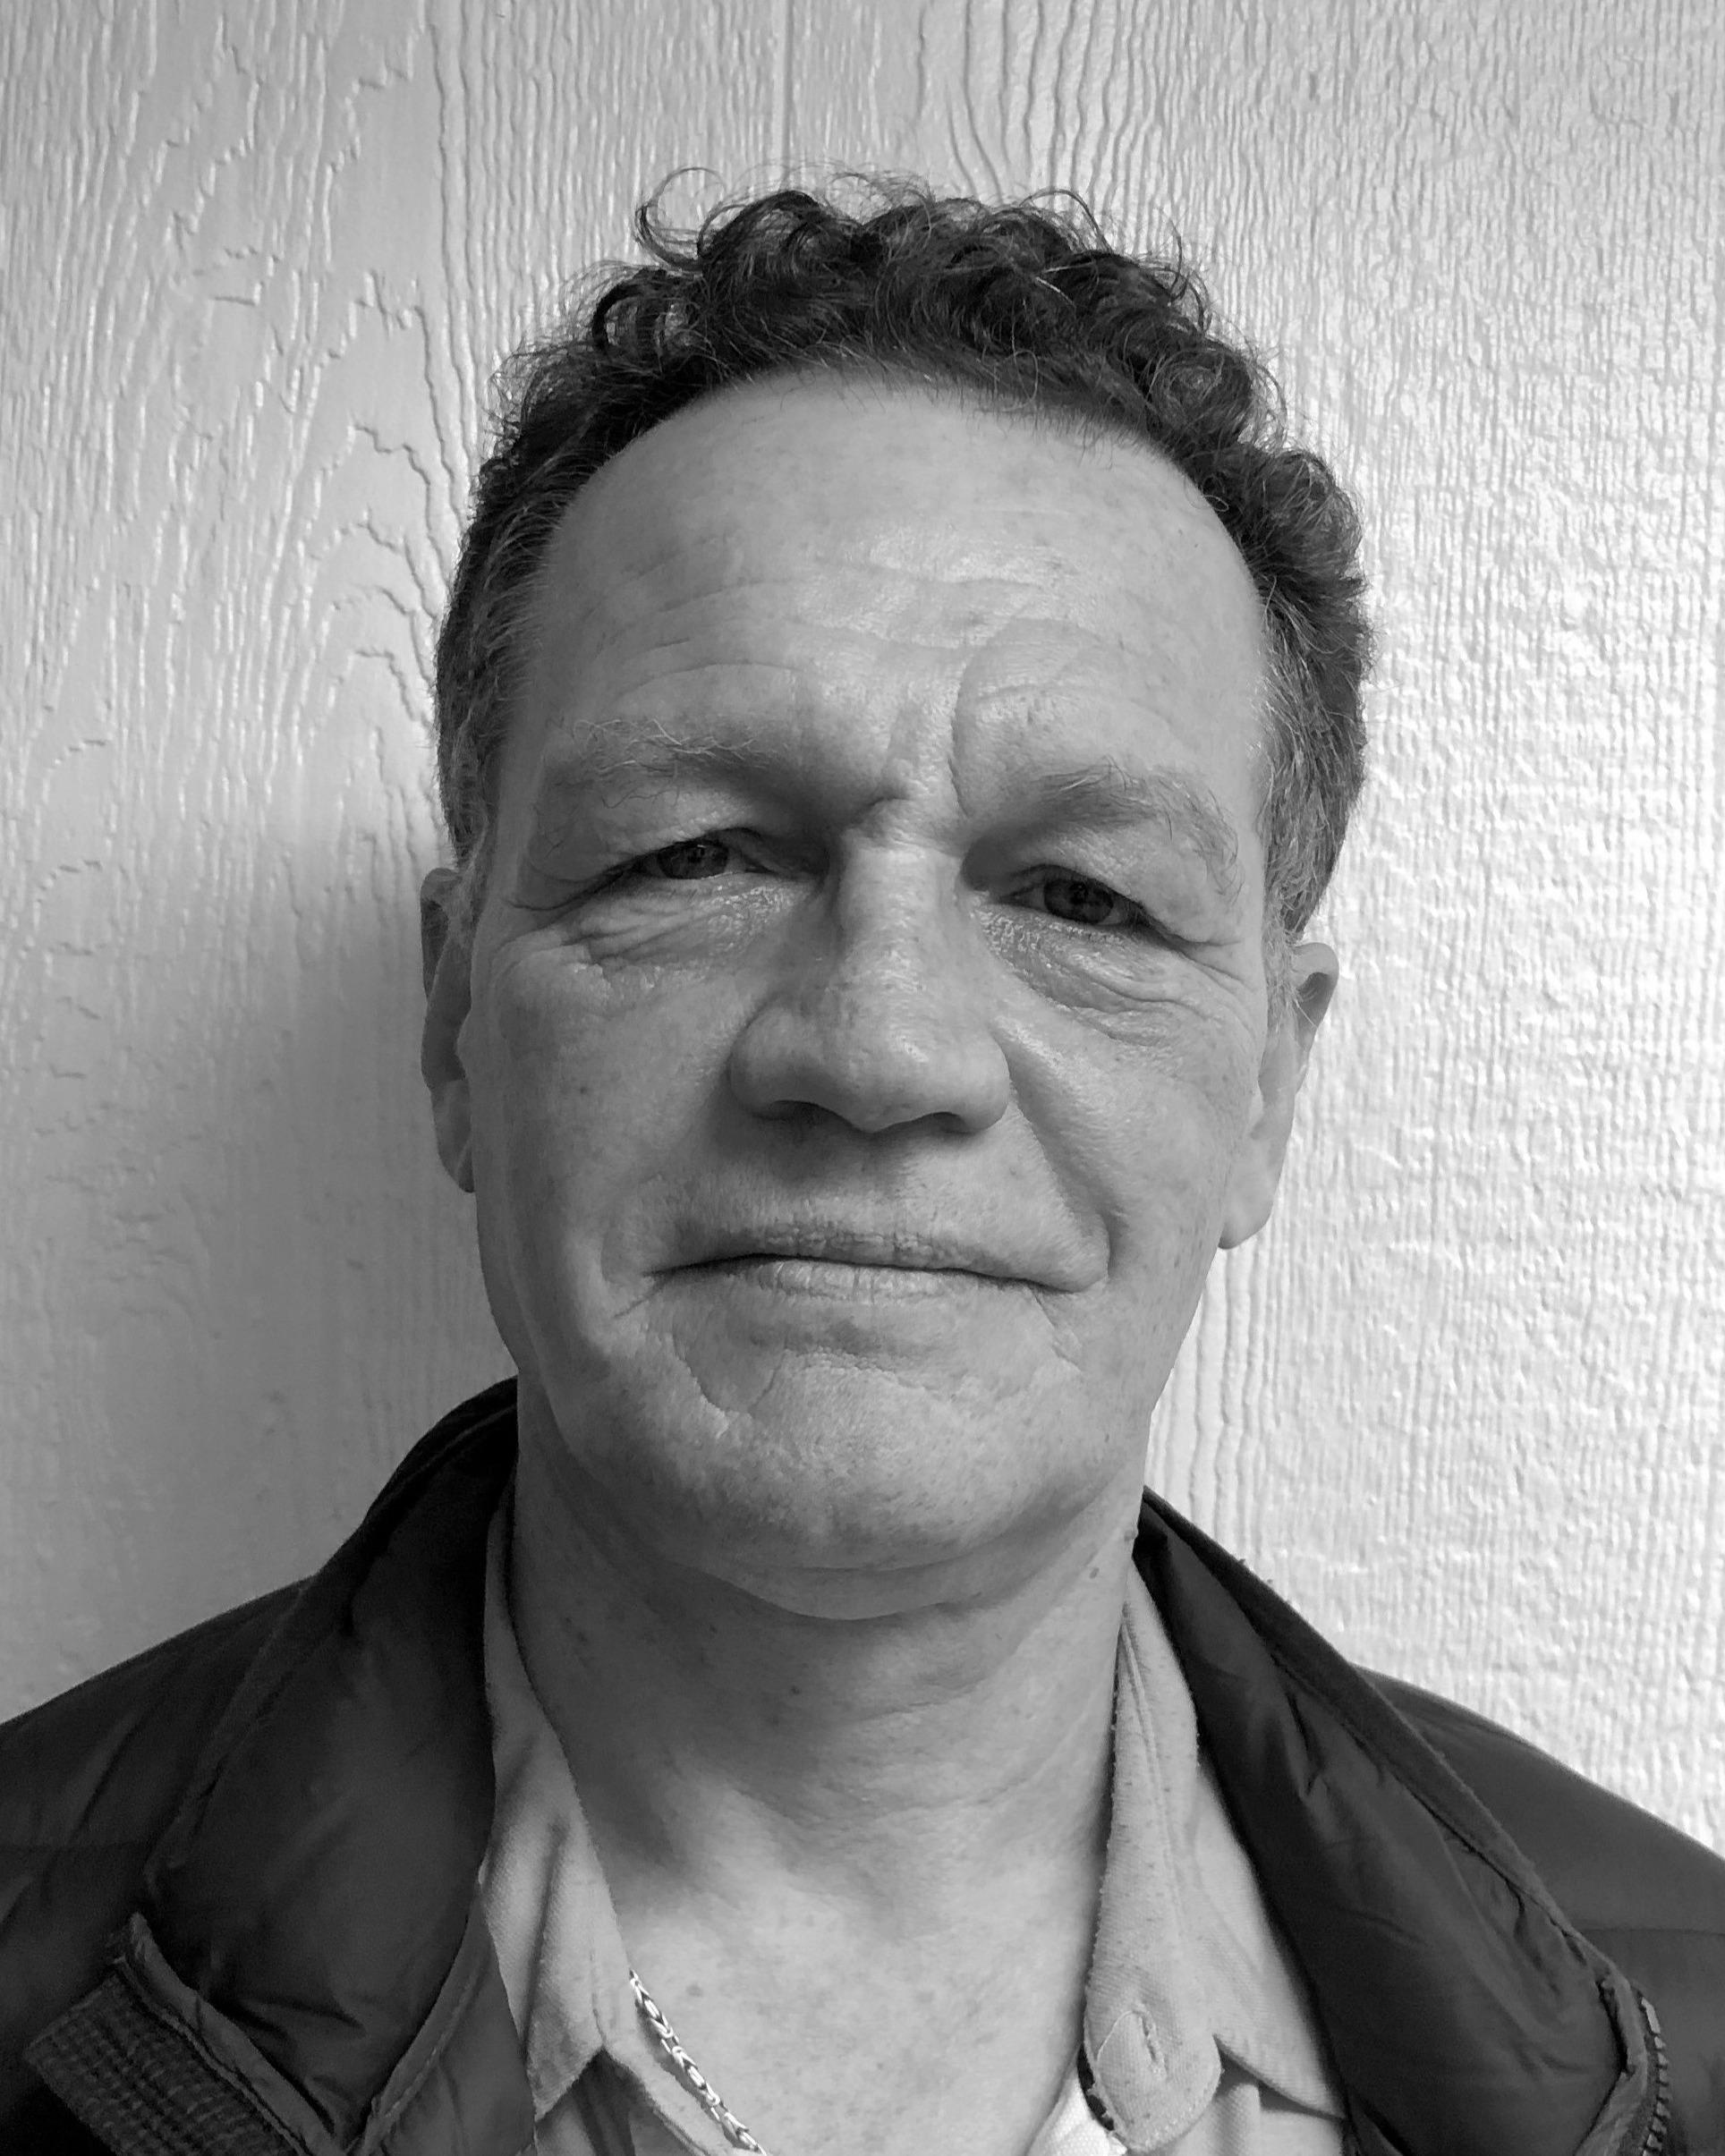 Allan Vestergaard